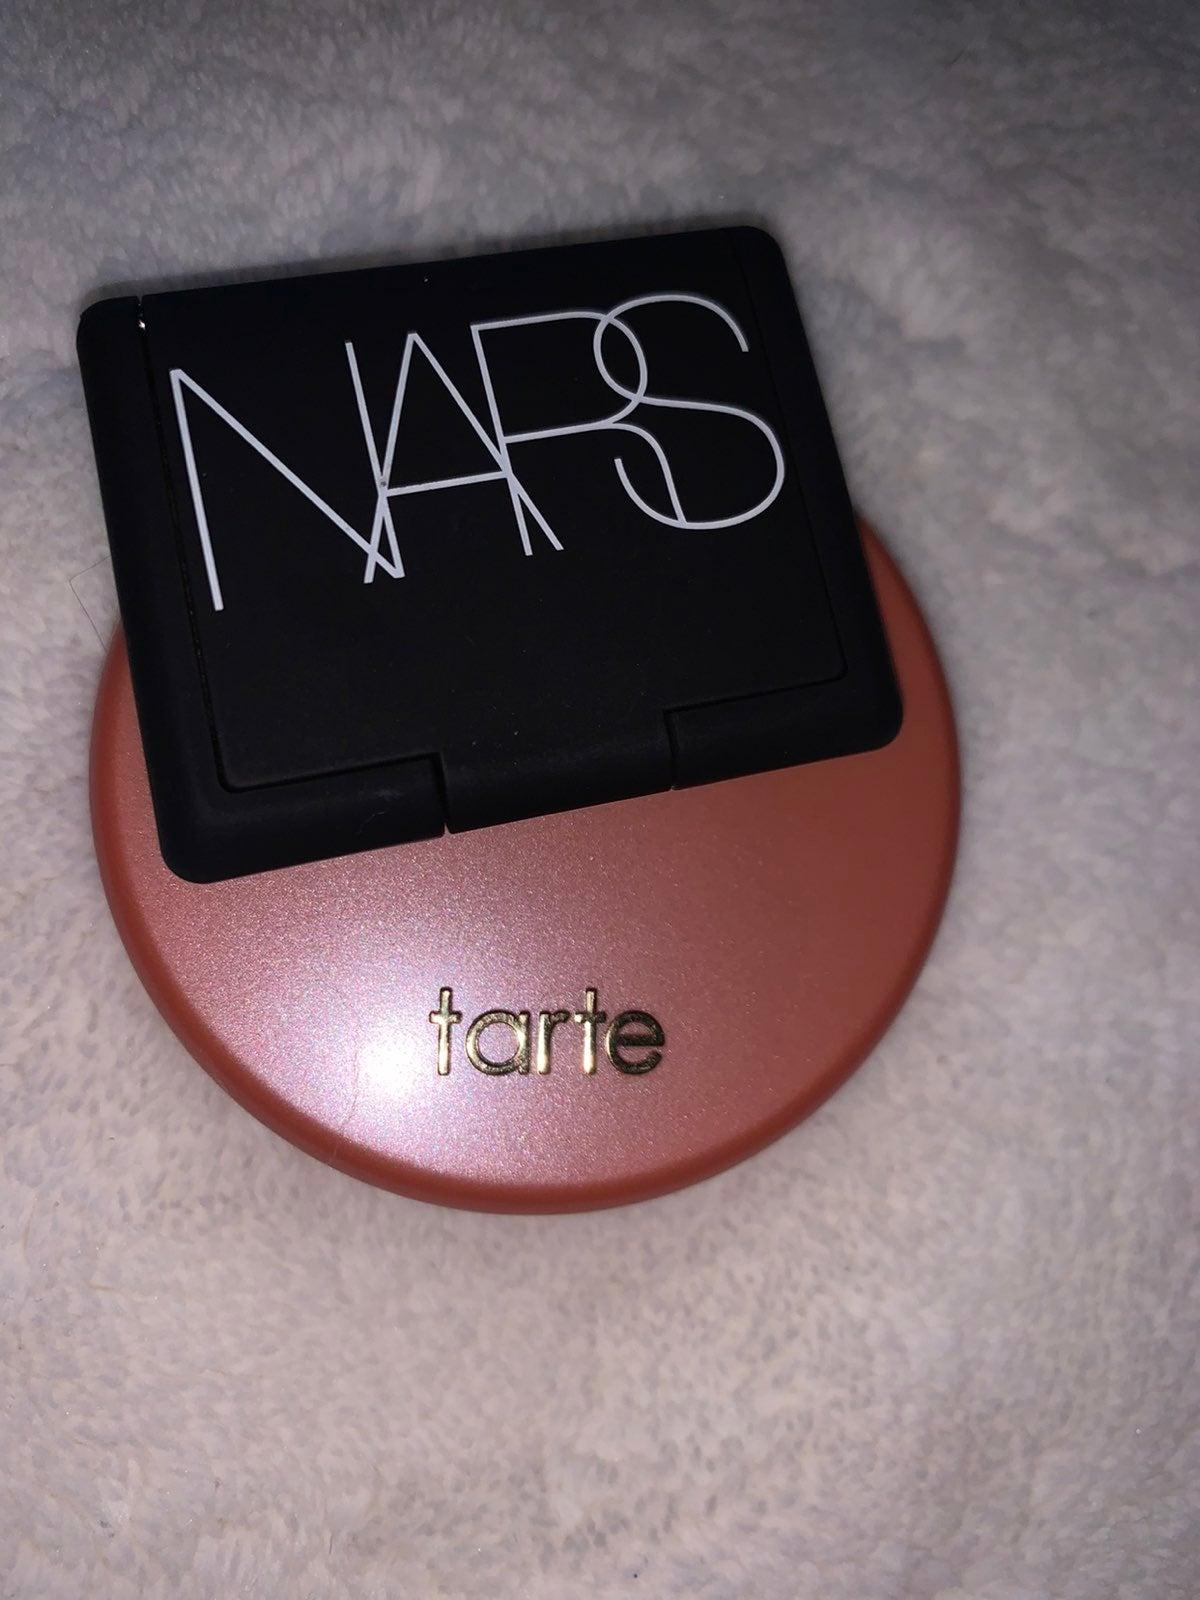 nars eye shadow & tarte blush